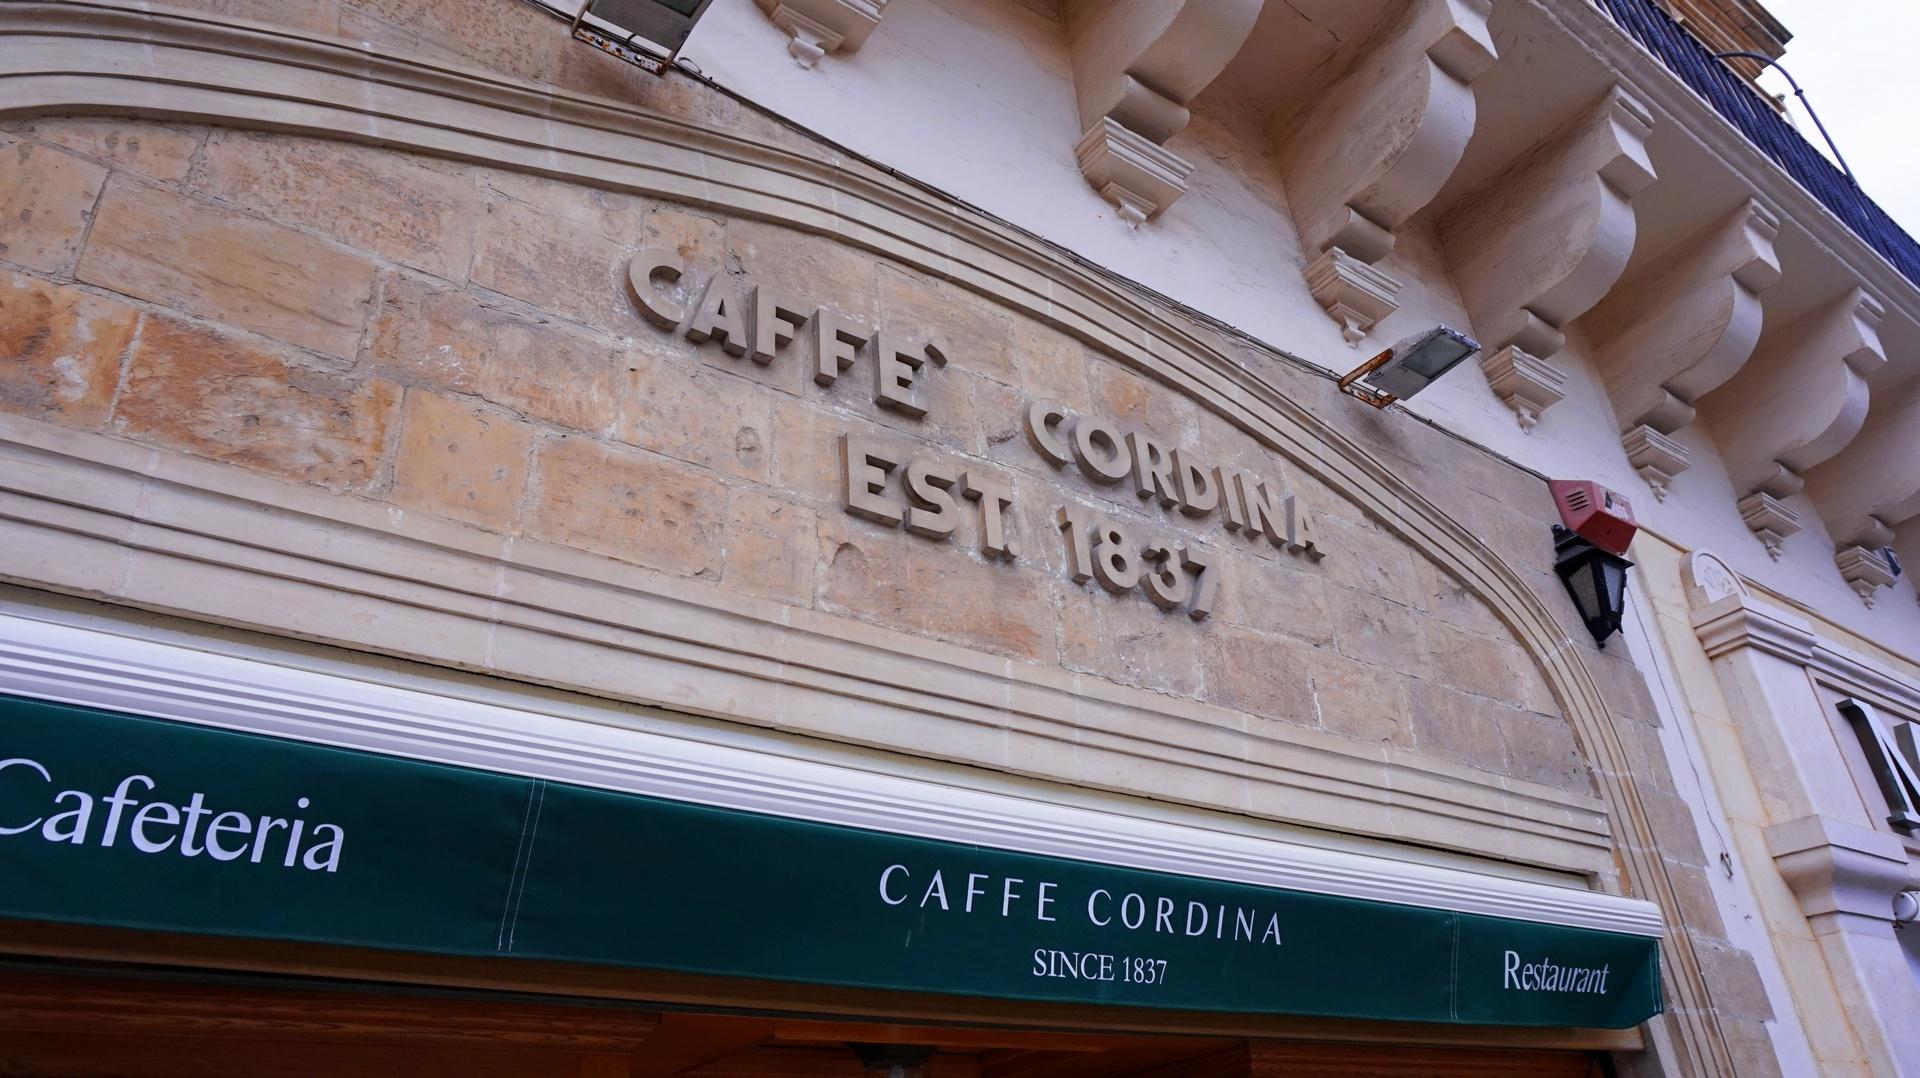 Bardzo znana na Malcie kawiarnia Caffe Cordina w Valletce | Sway the way